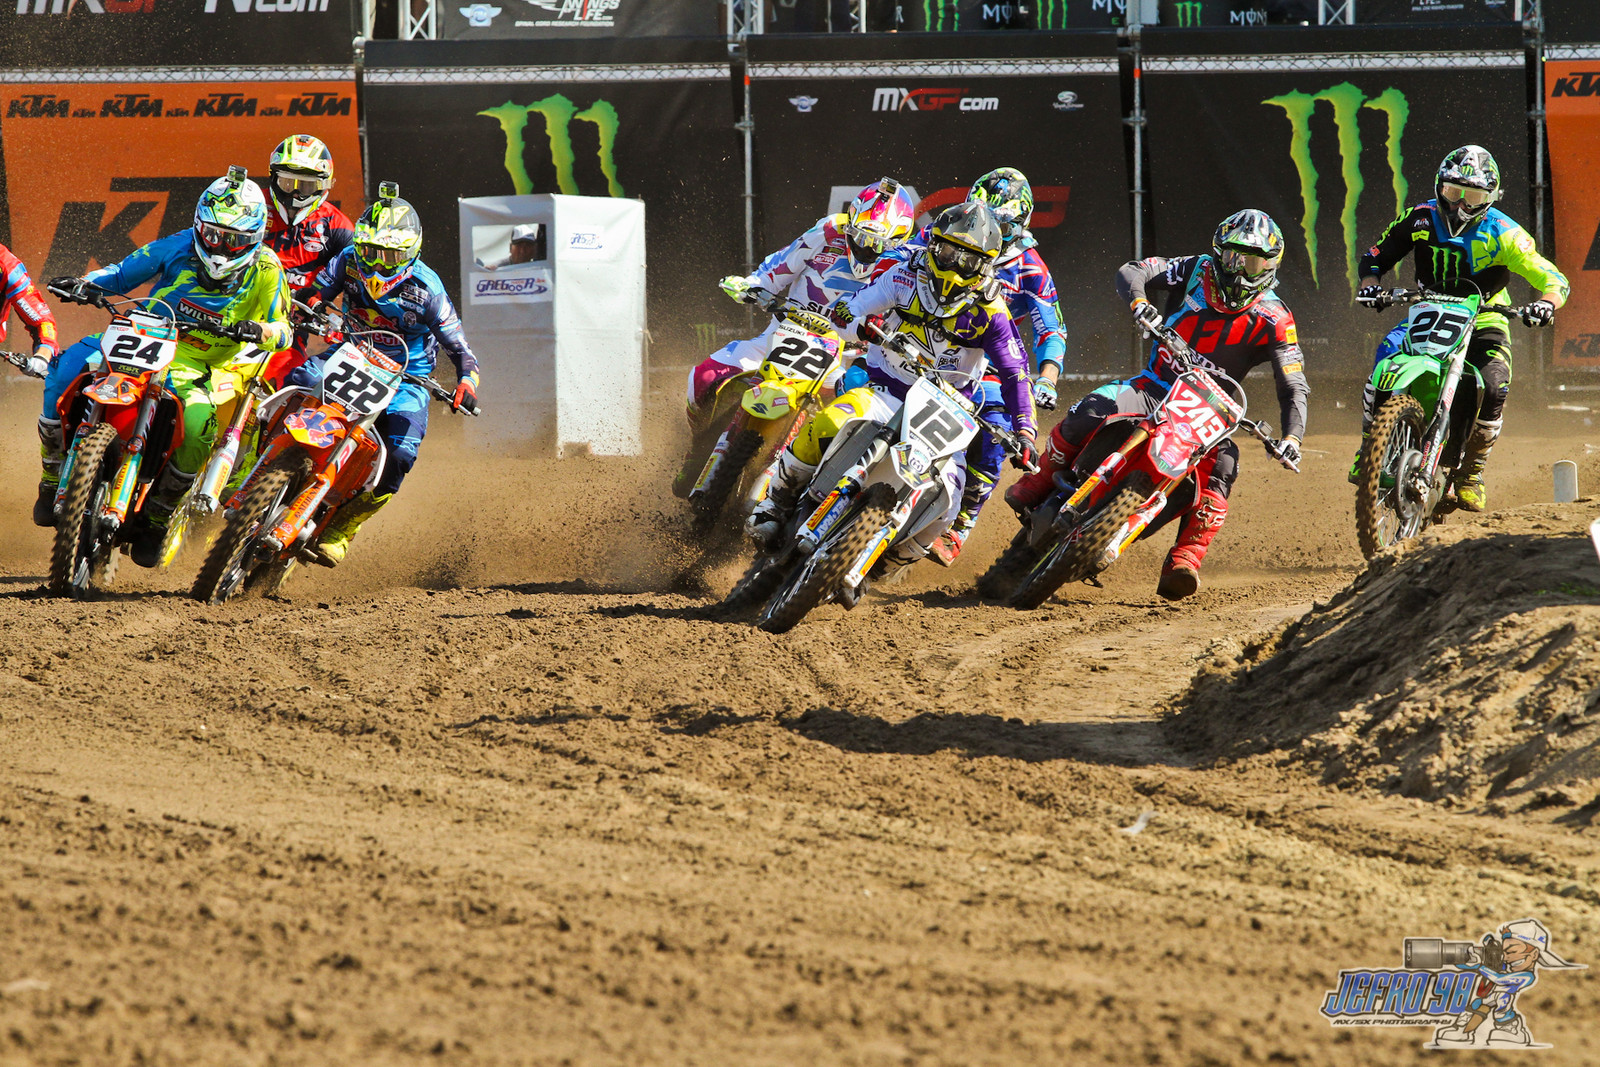 MXGP Start - Photo Gallery: MXGP of Limburg - Motocross Pictures - Vital MX